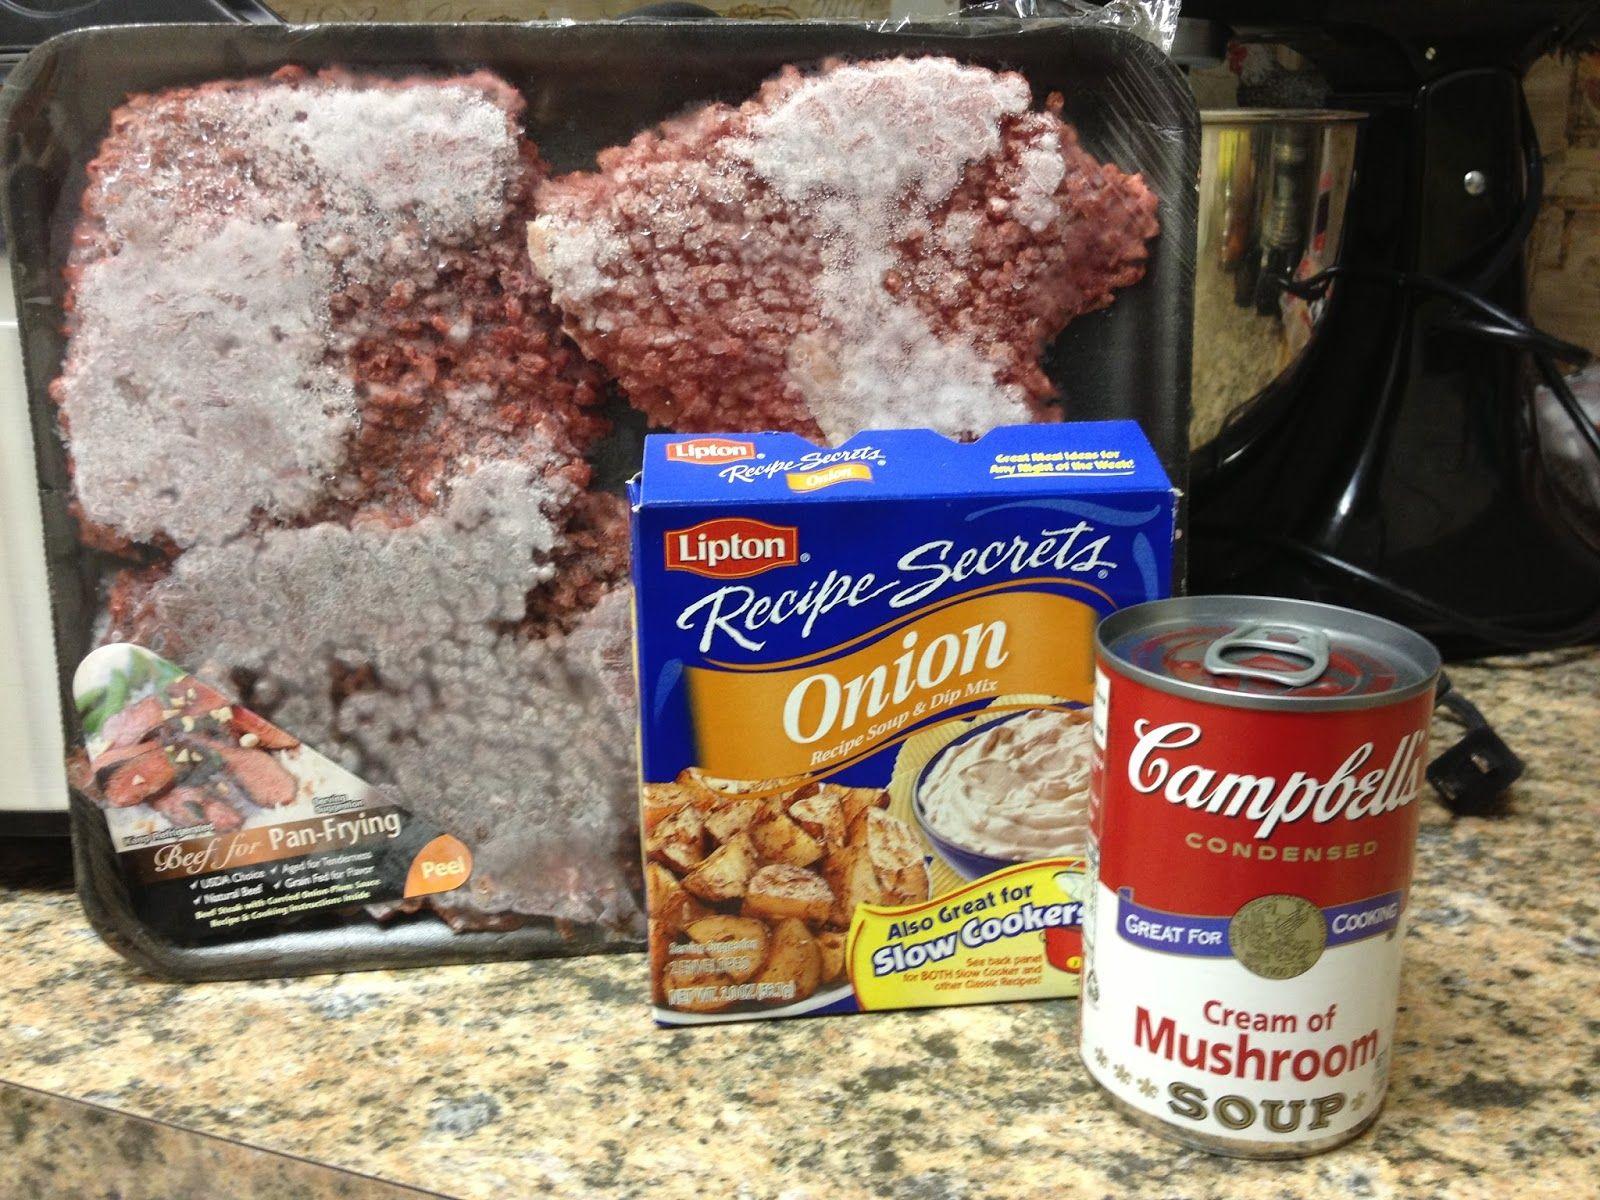 Onion Soup Mix Recipe Ground Beef And Cream Of Mushroom In Crockpot Put The Cube Stea Cube Steak Crock Pot Recipes Cube Steak Recipes Beef Cube Steak Recipes